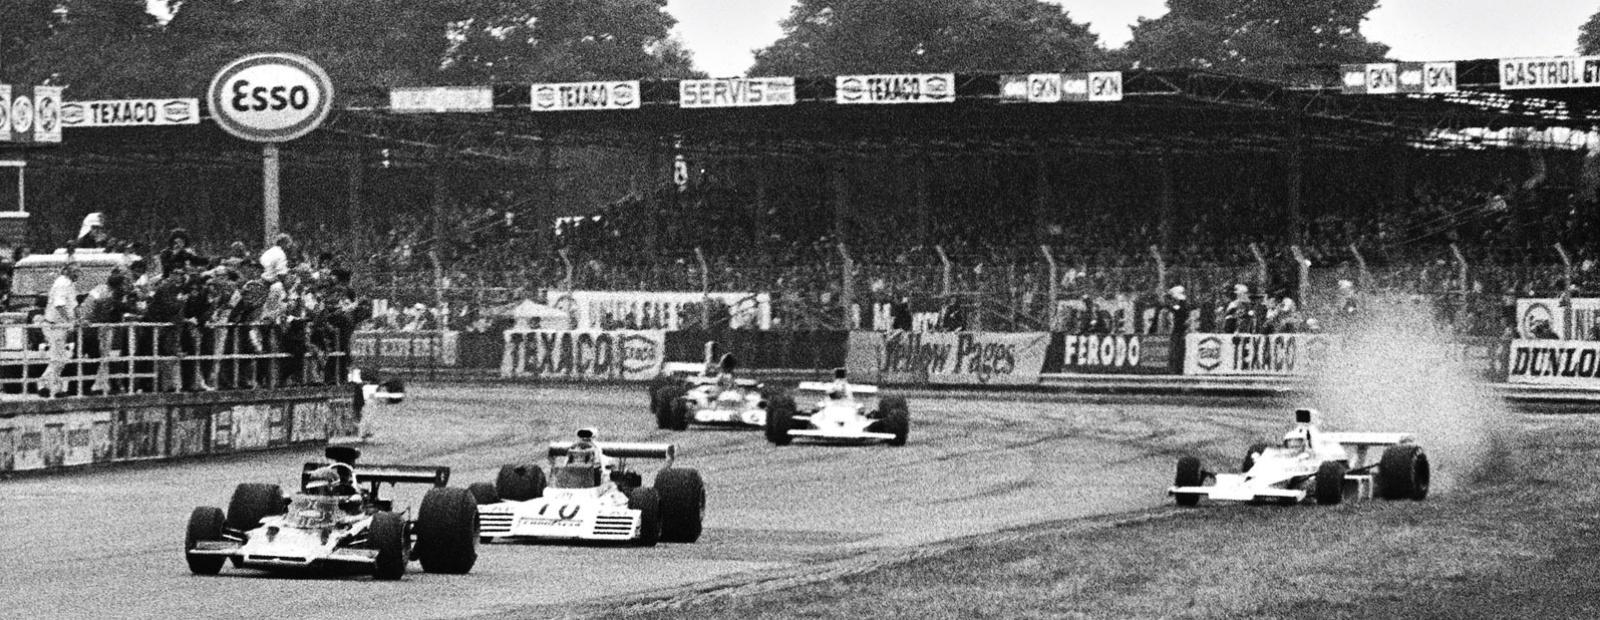 McLaren Formula 1   Silverstone 1973: Alan Henryu0027s Journey Into F1